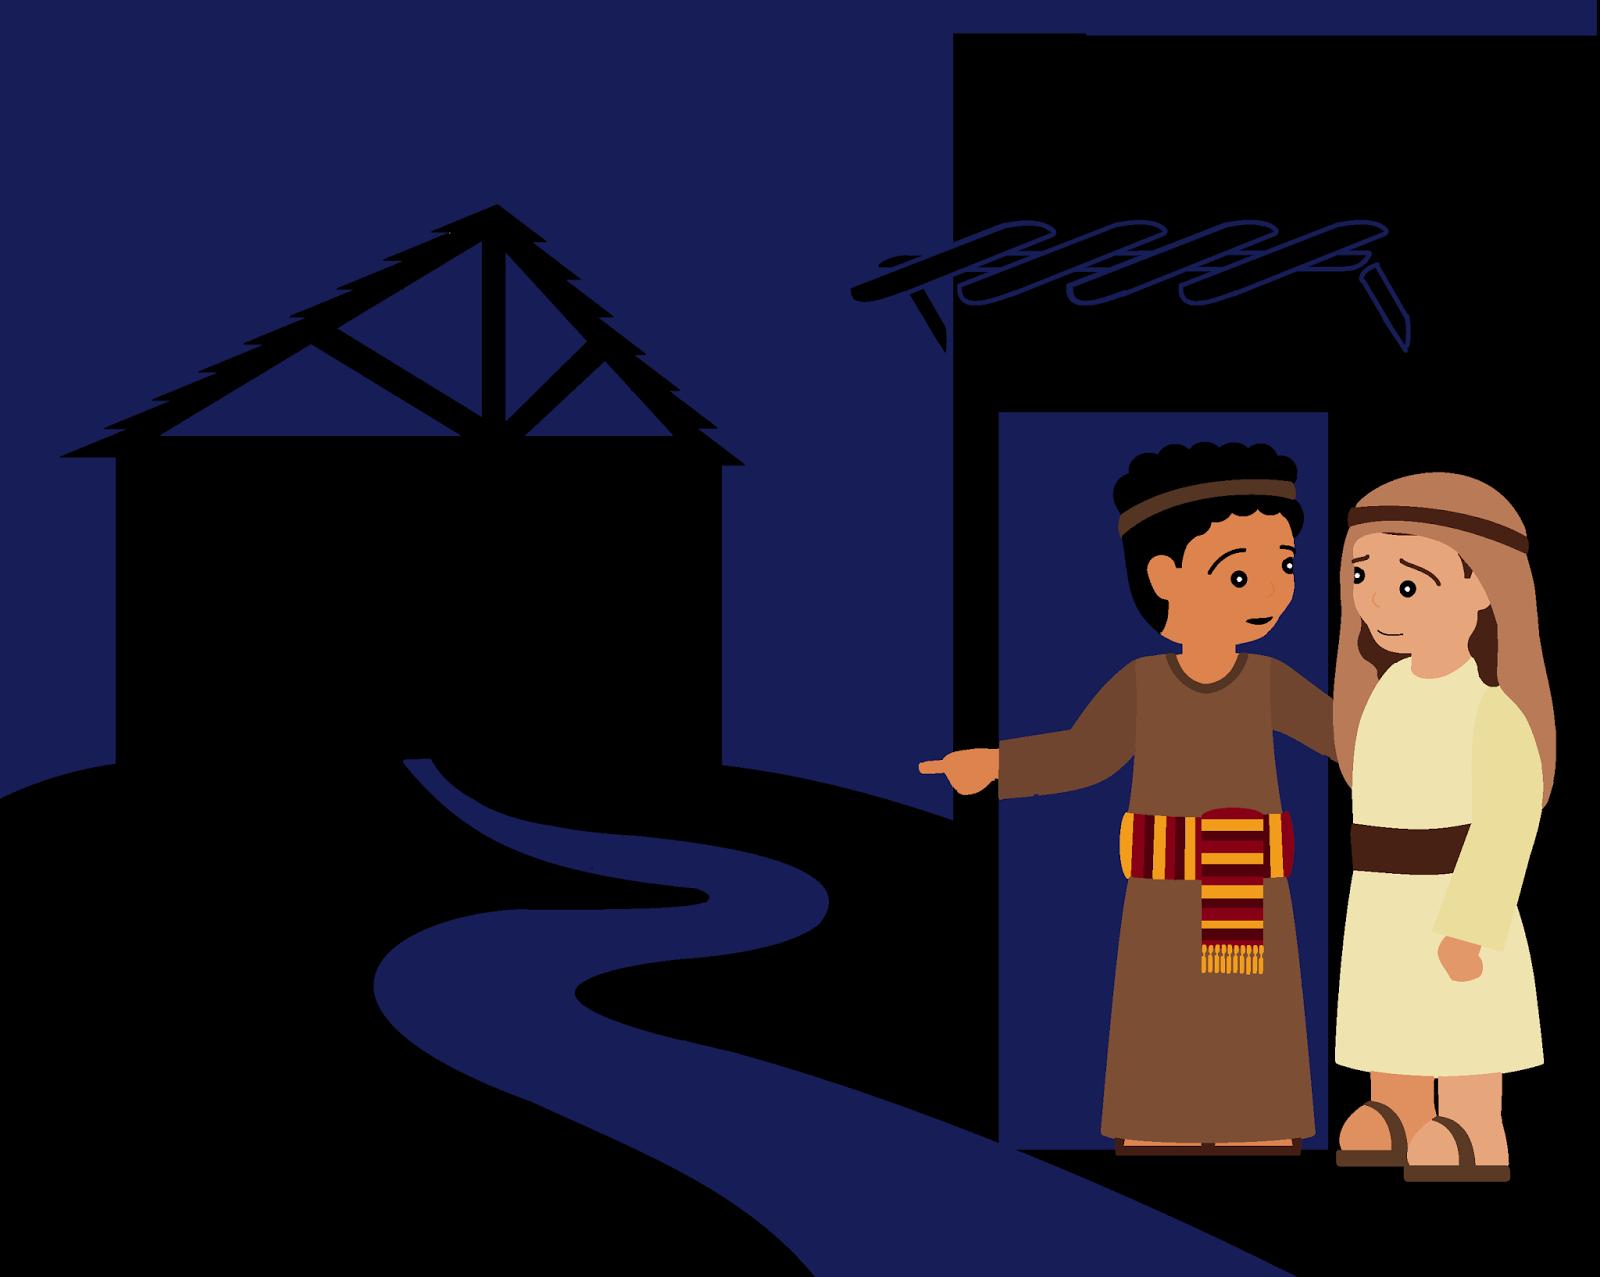 Bethlehem clipart animated. Song when joseph went